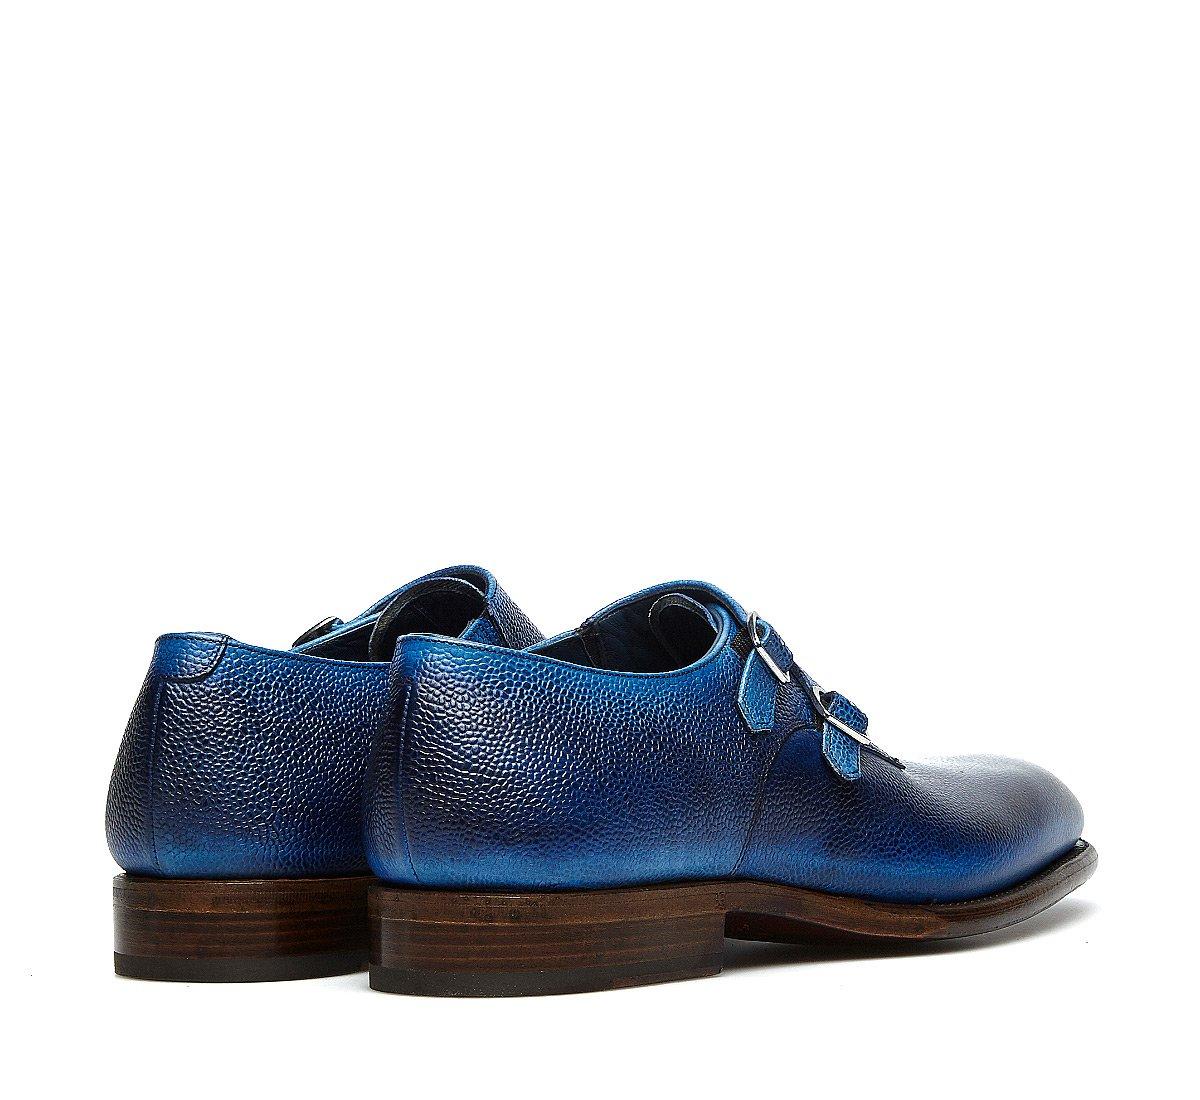 Fabi Flex Goodyear double monk strap shoes